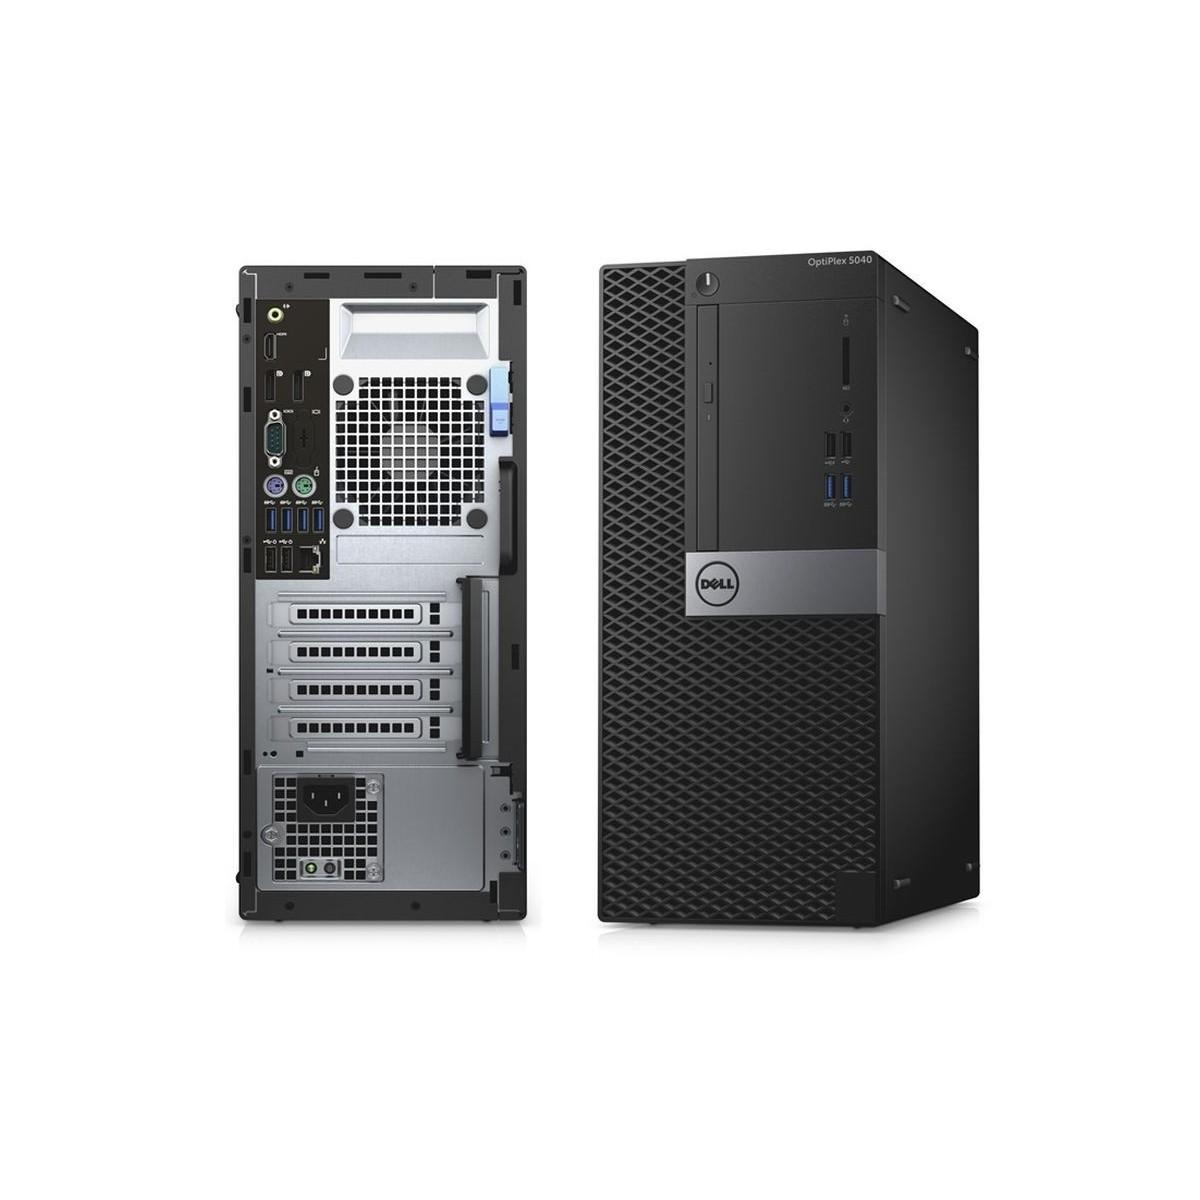 DELL 5040 MT i5-6500 8GB 500GB SSD 500GB HDD W10